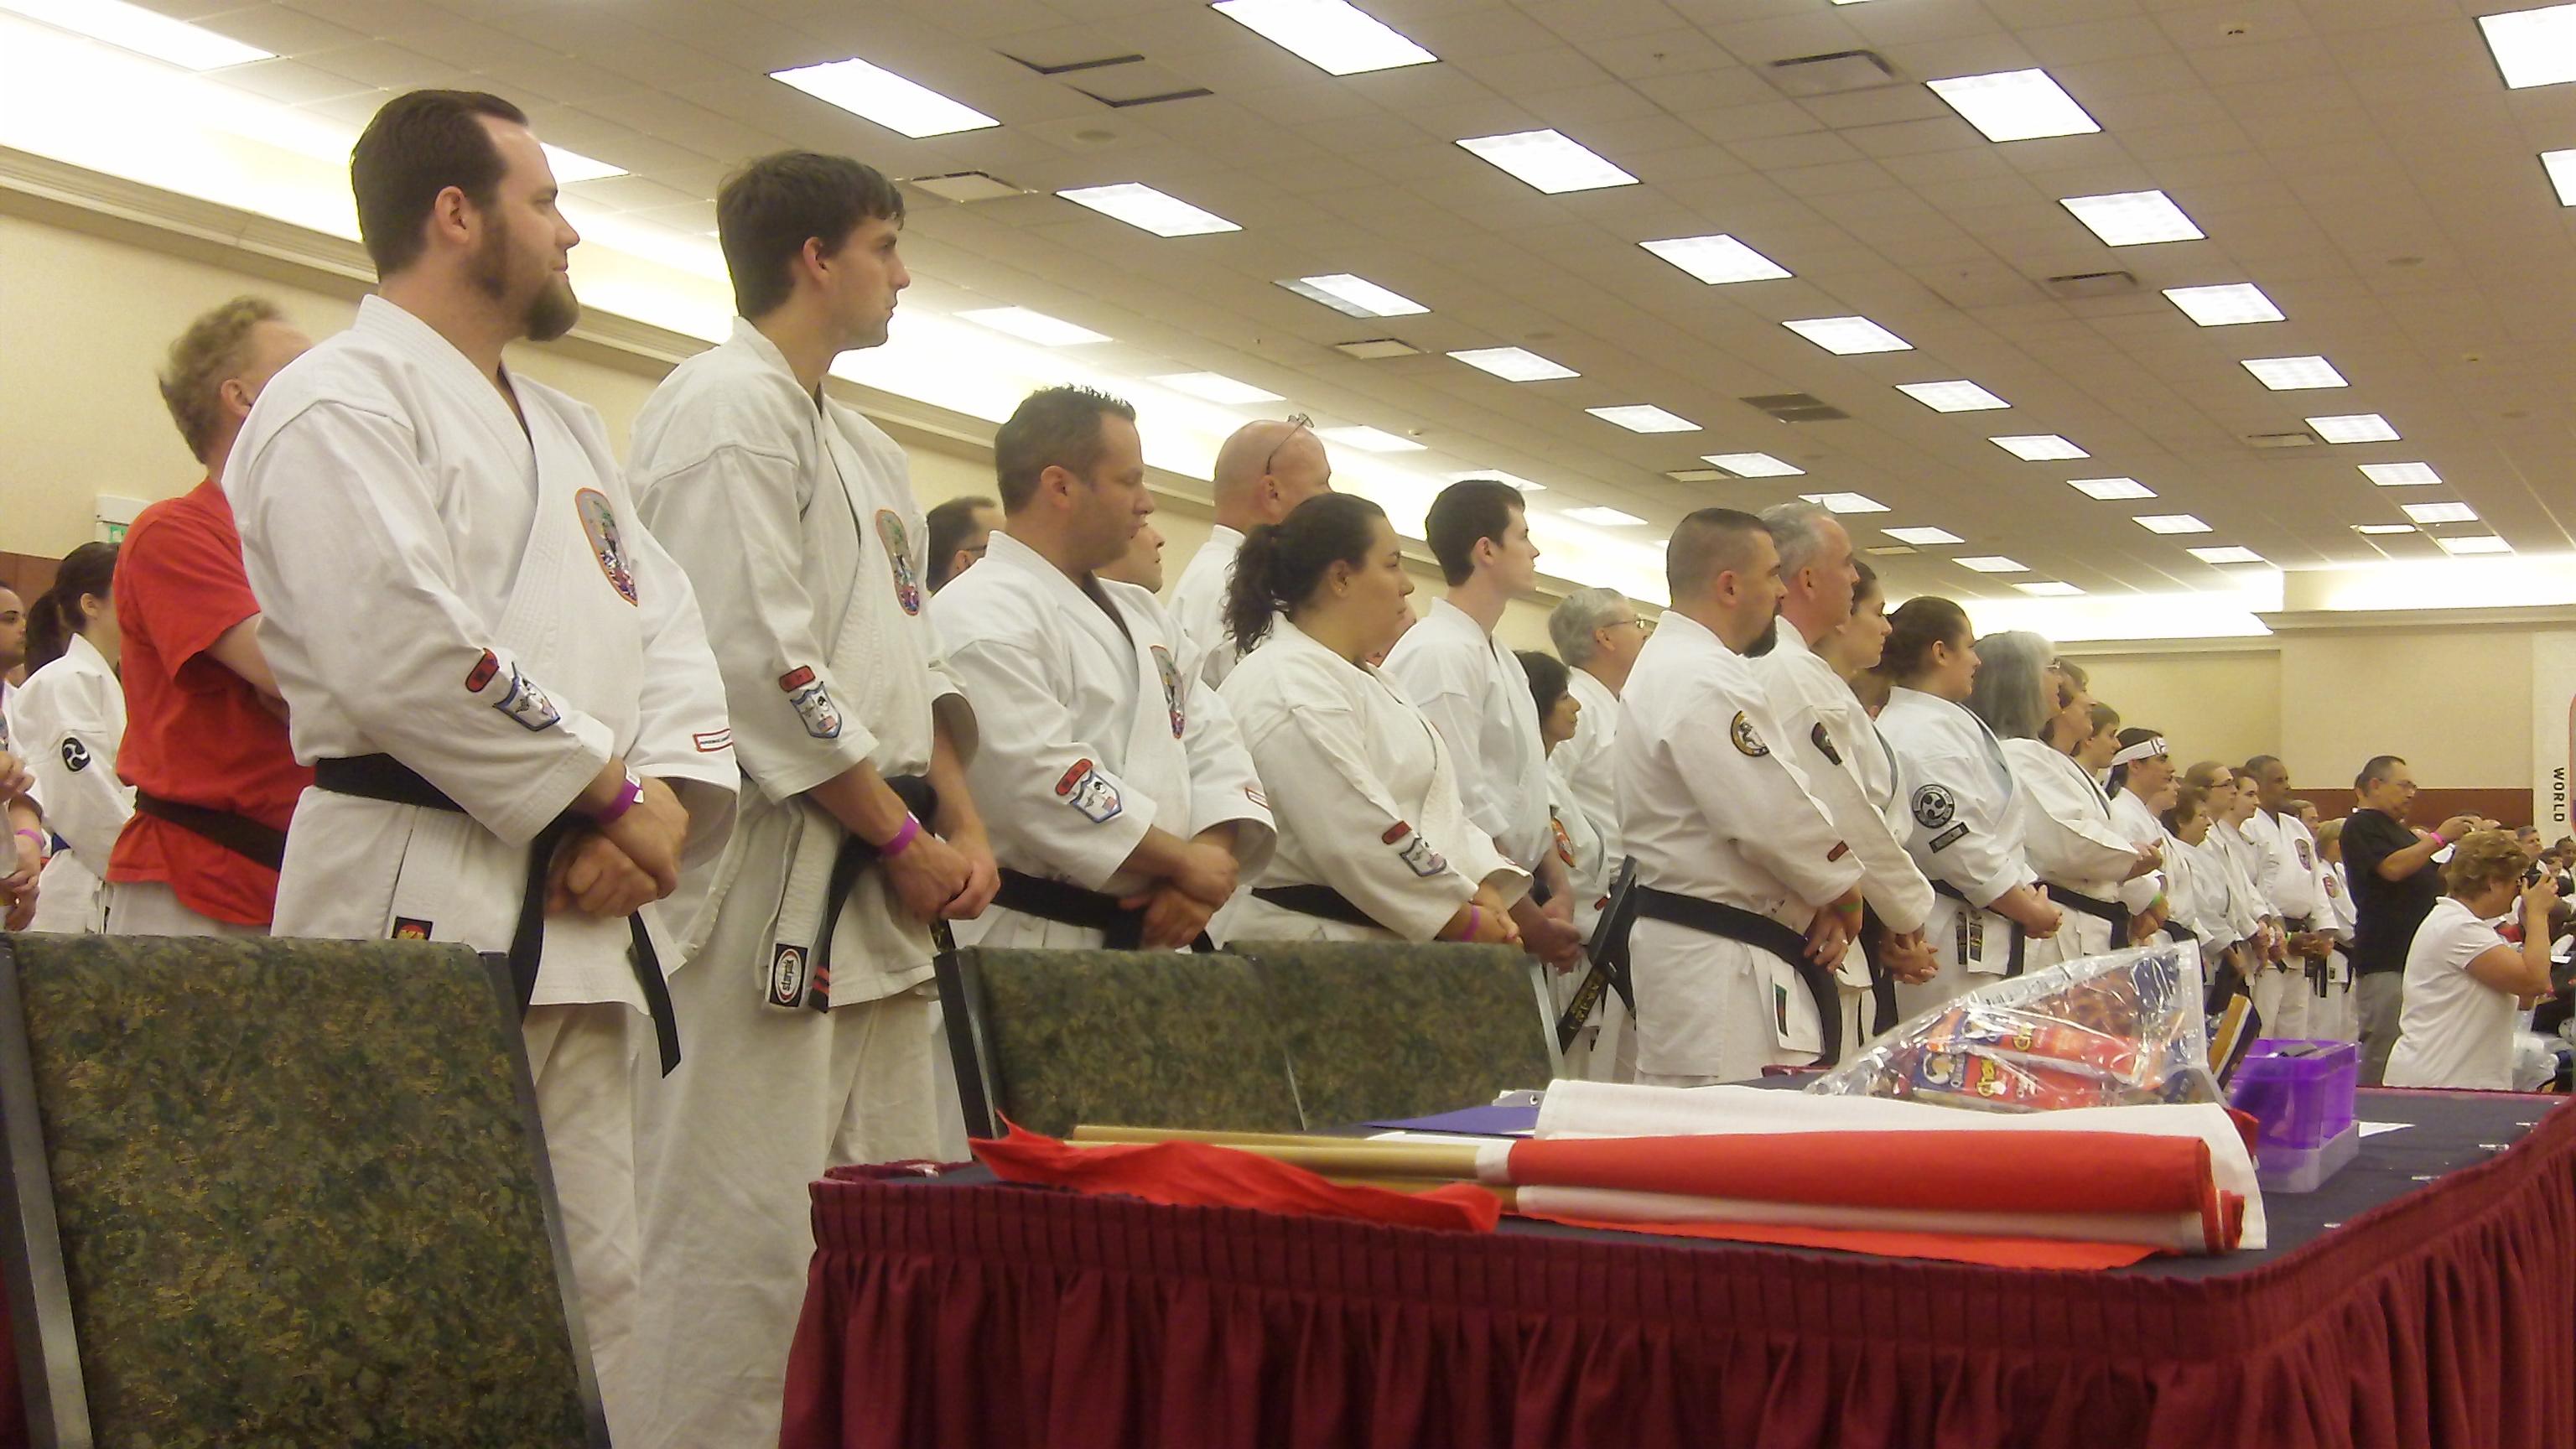 Isshinryu Karate World Tournament (IWKA).